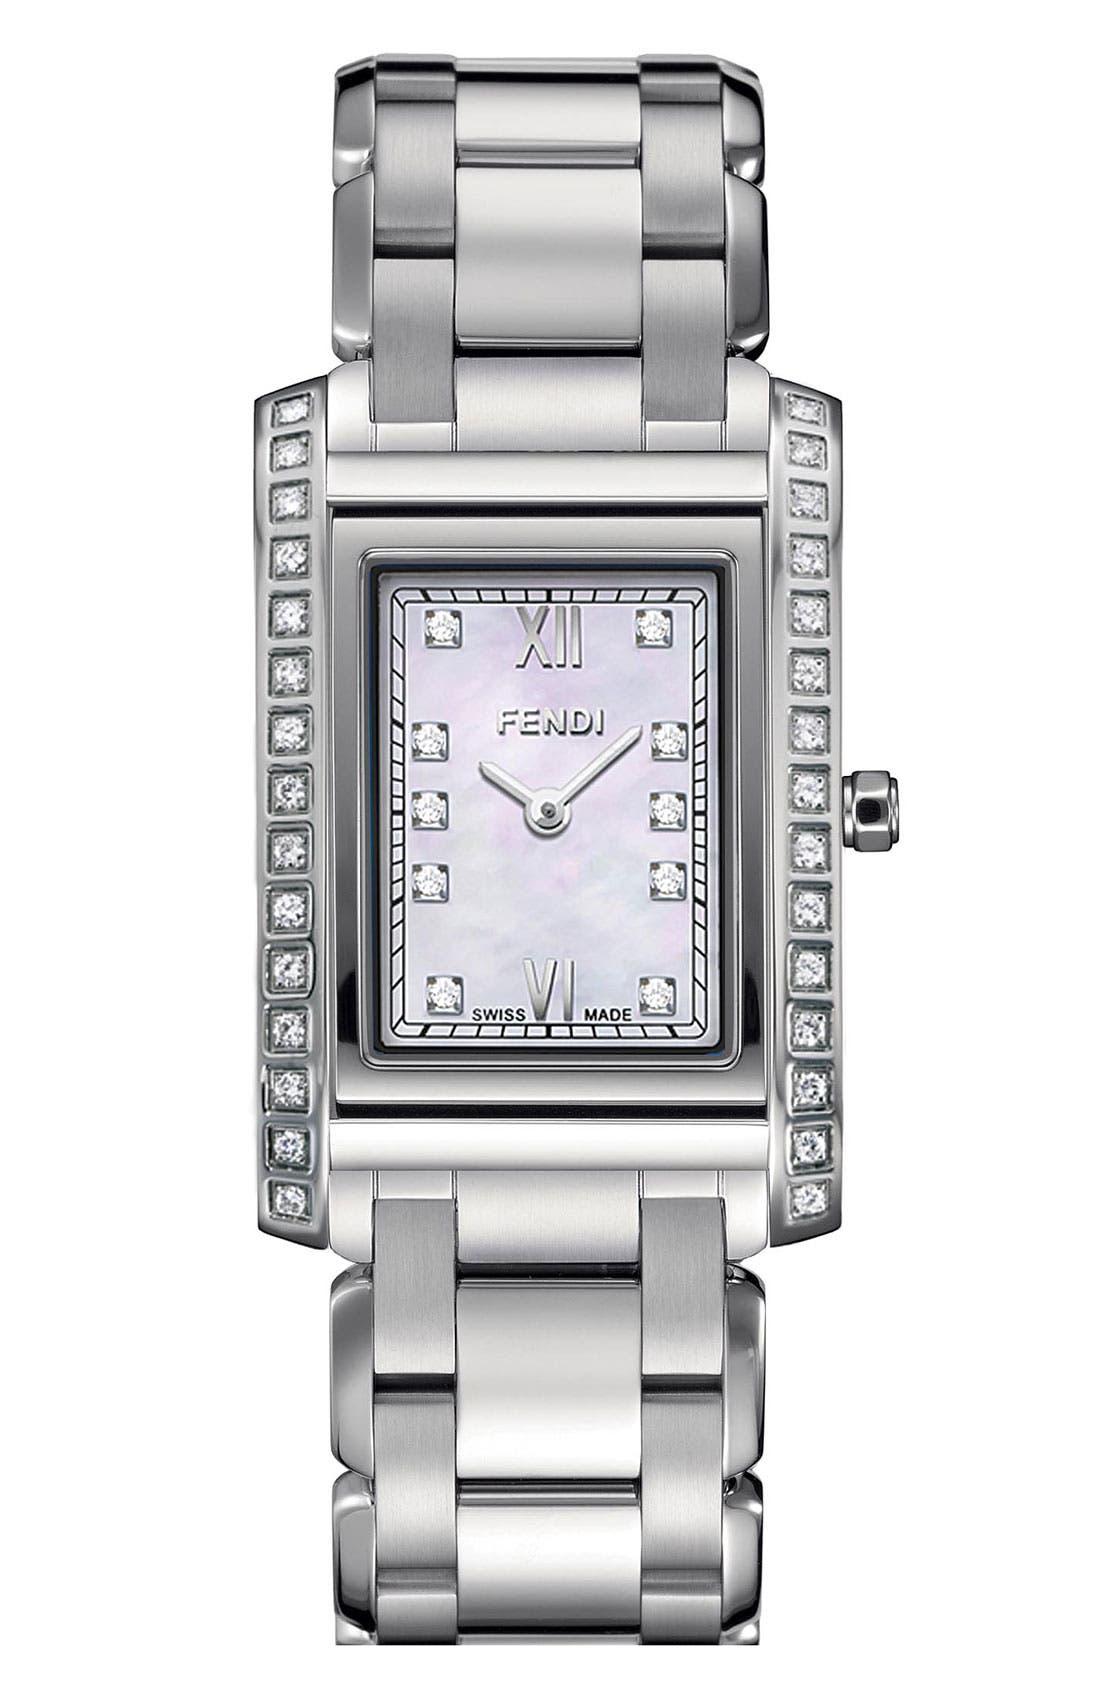 Alternate Image 1 Selected - Fendi 'Loop - Small' Diamond Bracelet Watch, 21mm x 34mm